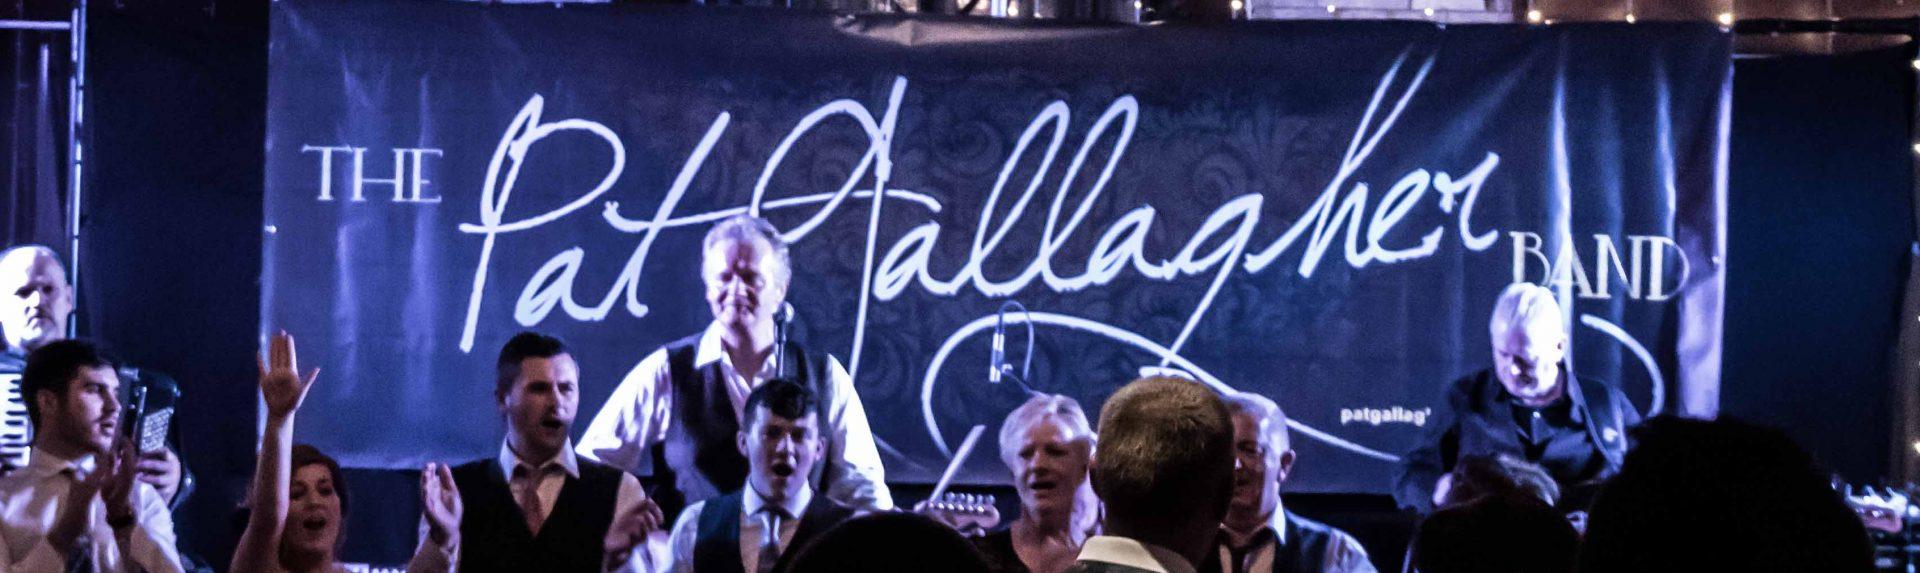 Pat Gallagher Wedding Band